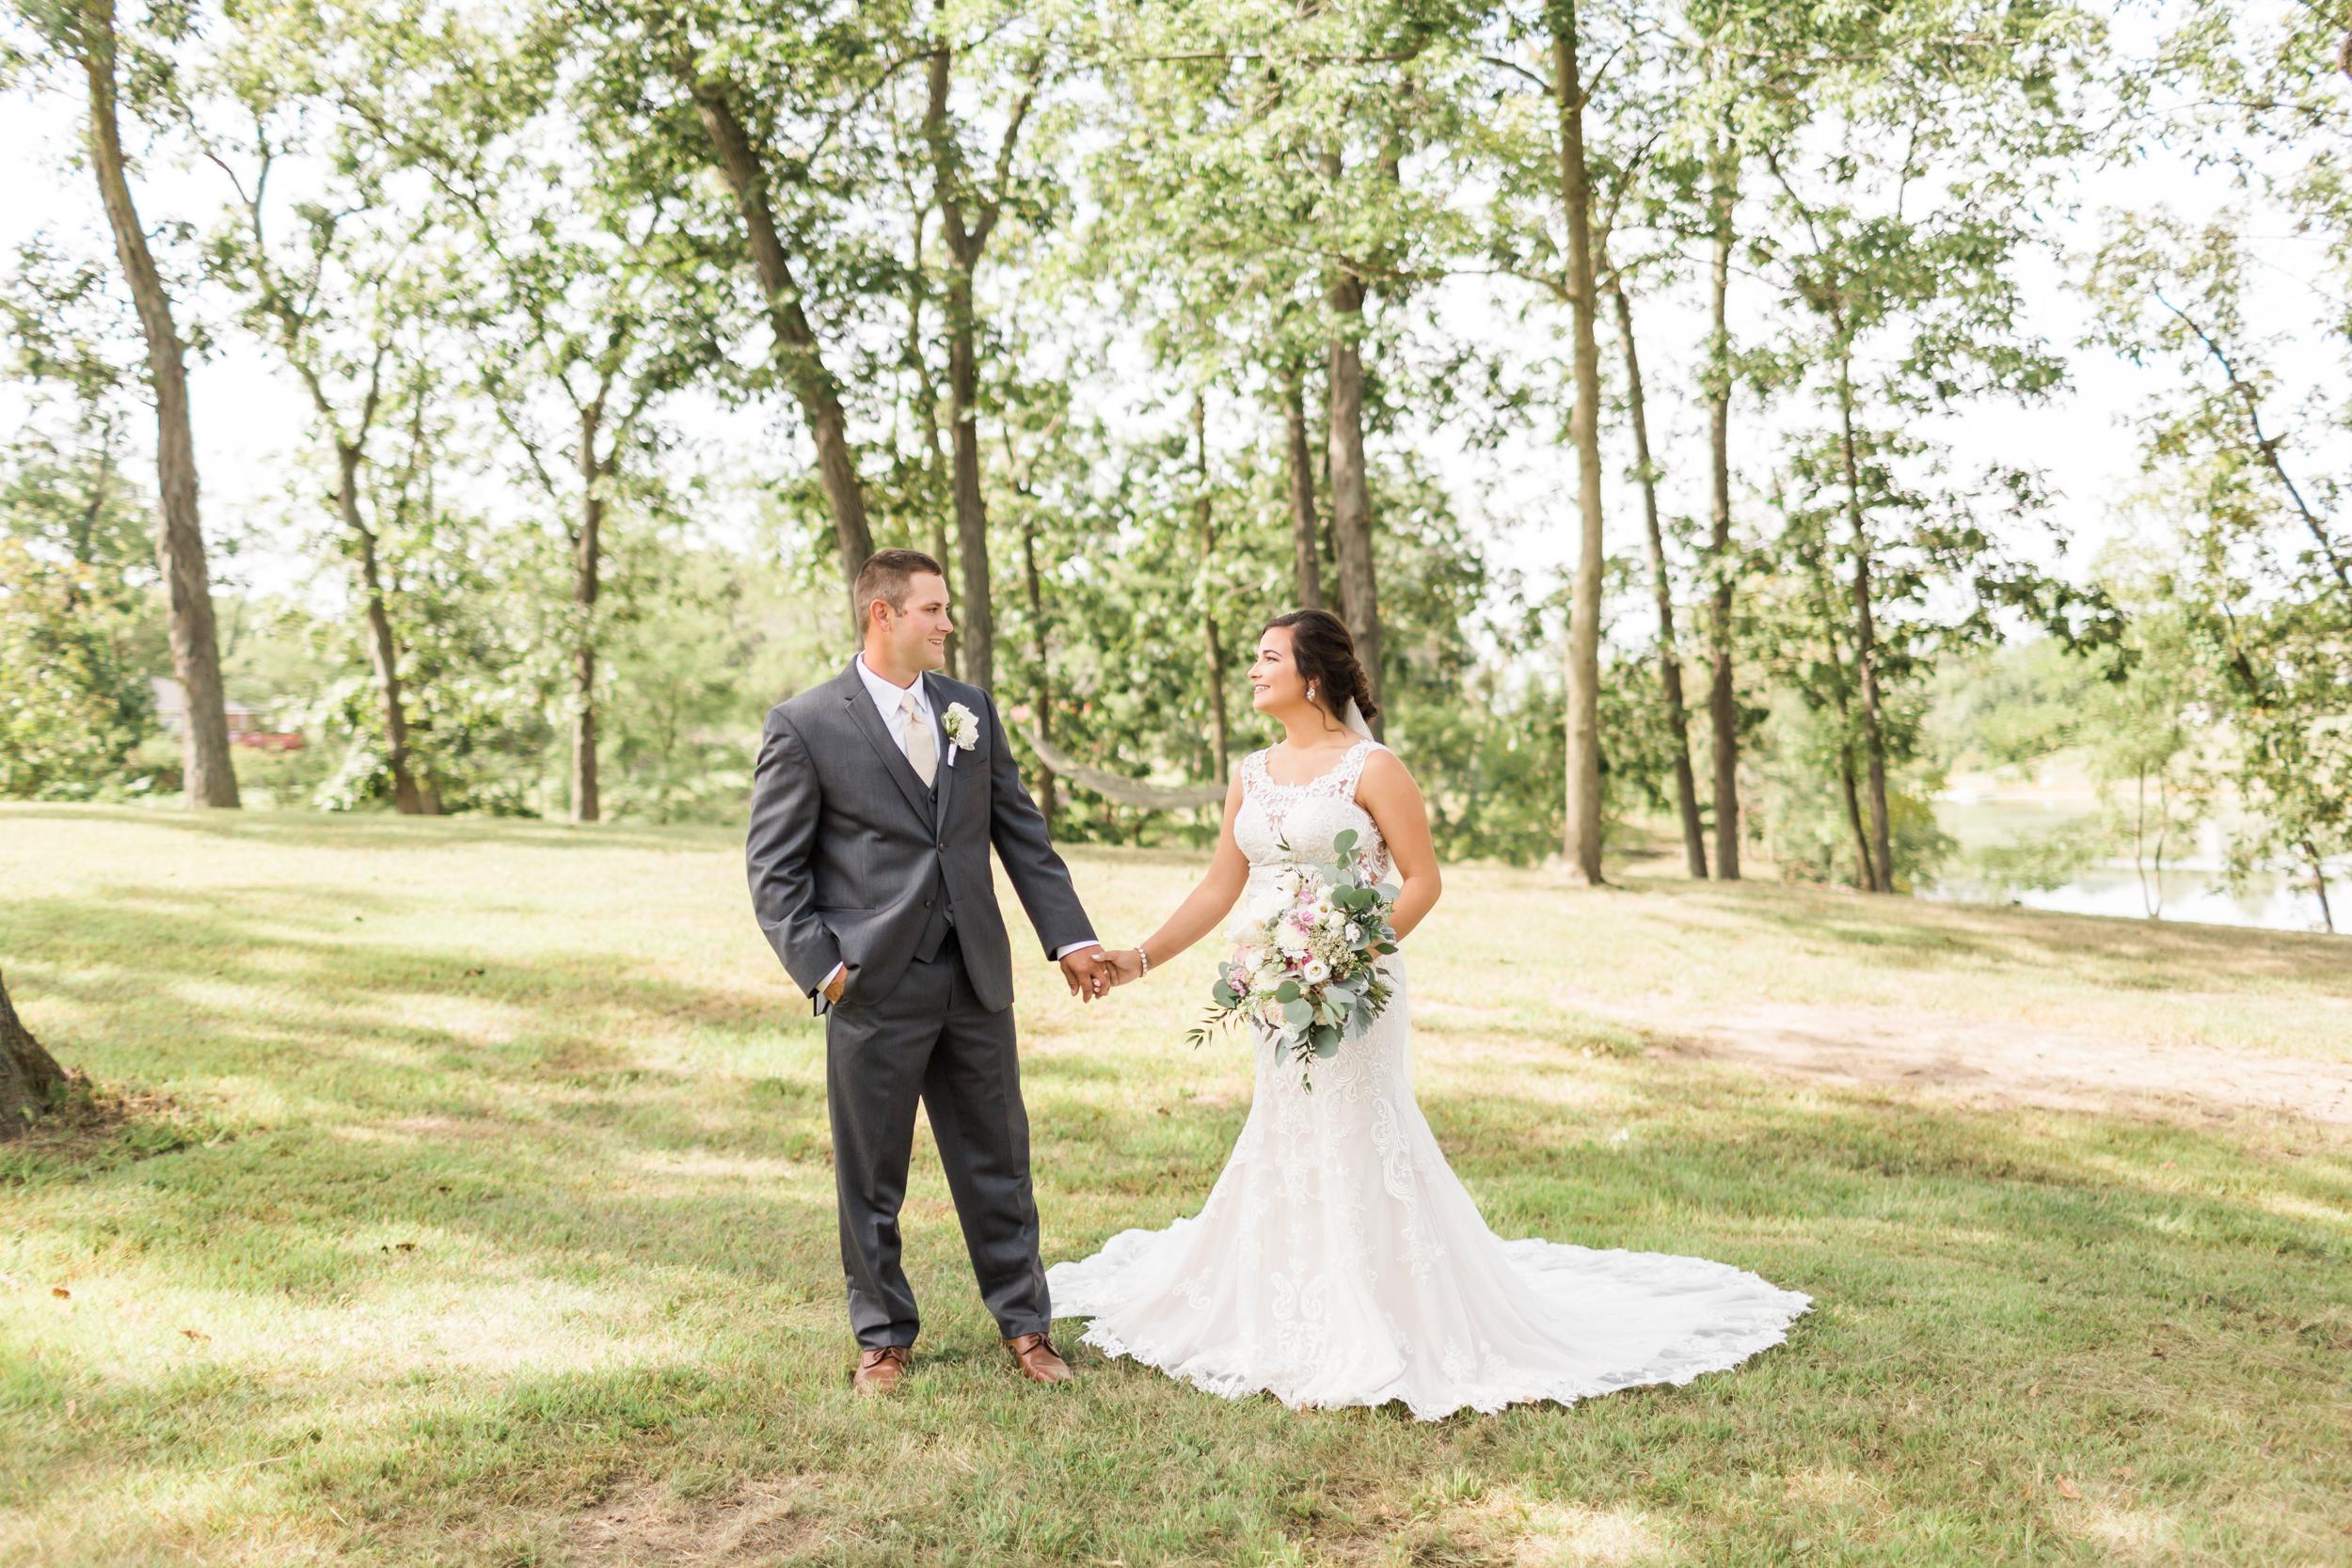 romanticcountrywedding--39.jpg